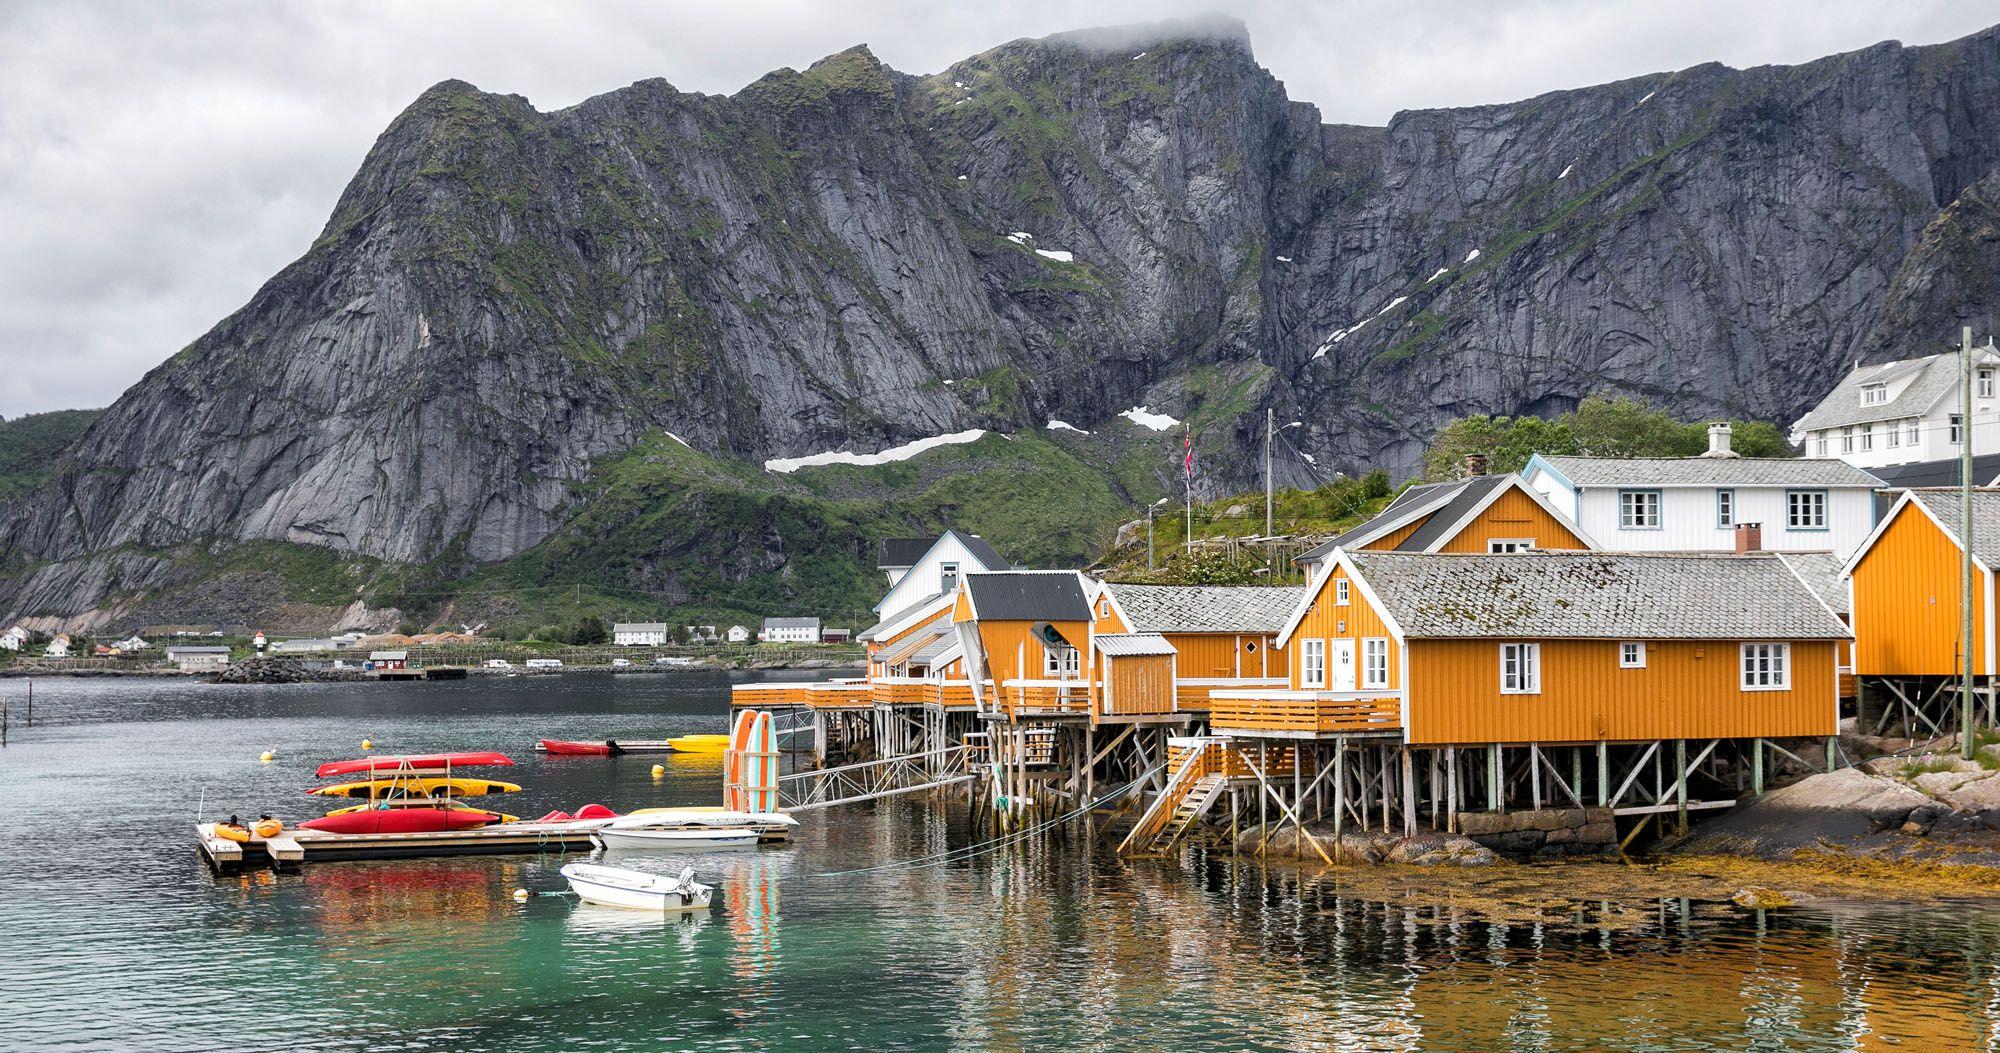 Where to Stay in Lofoten Islands